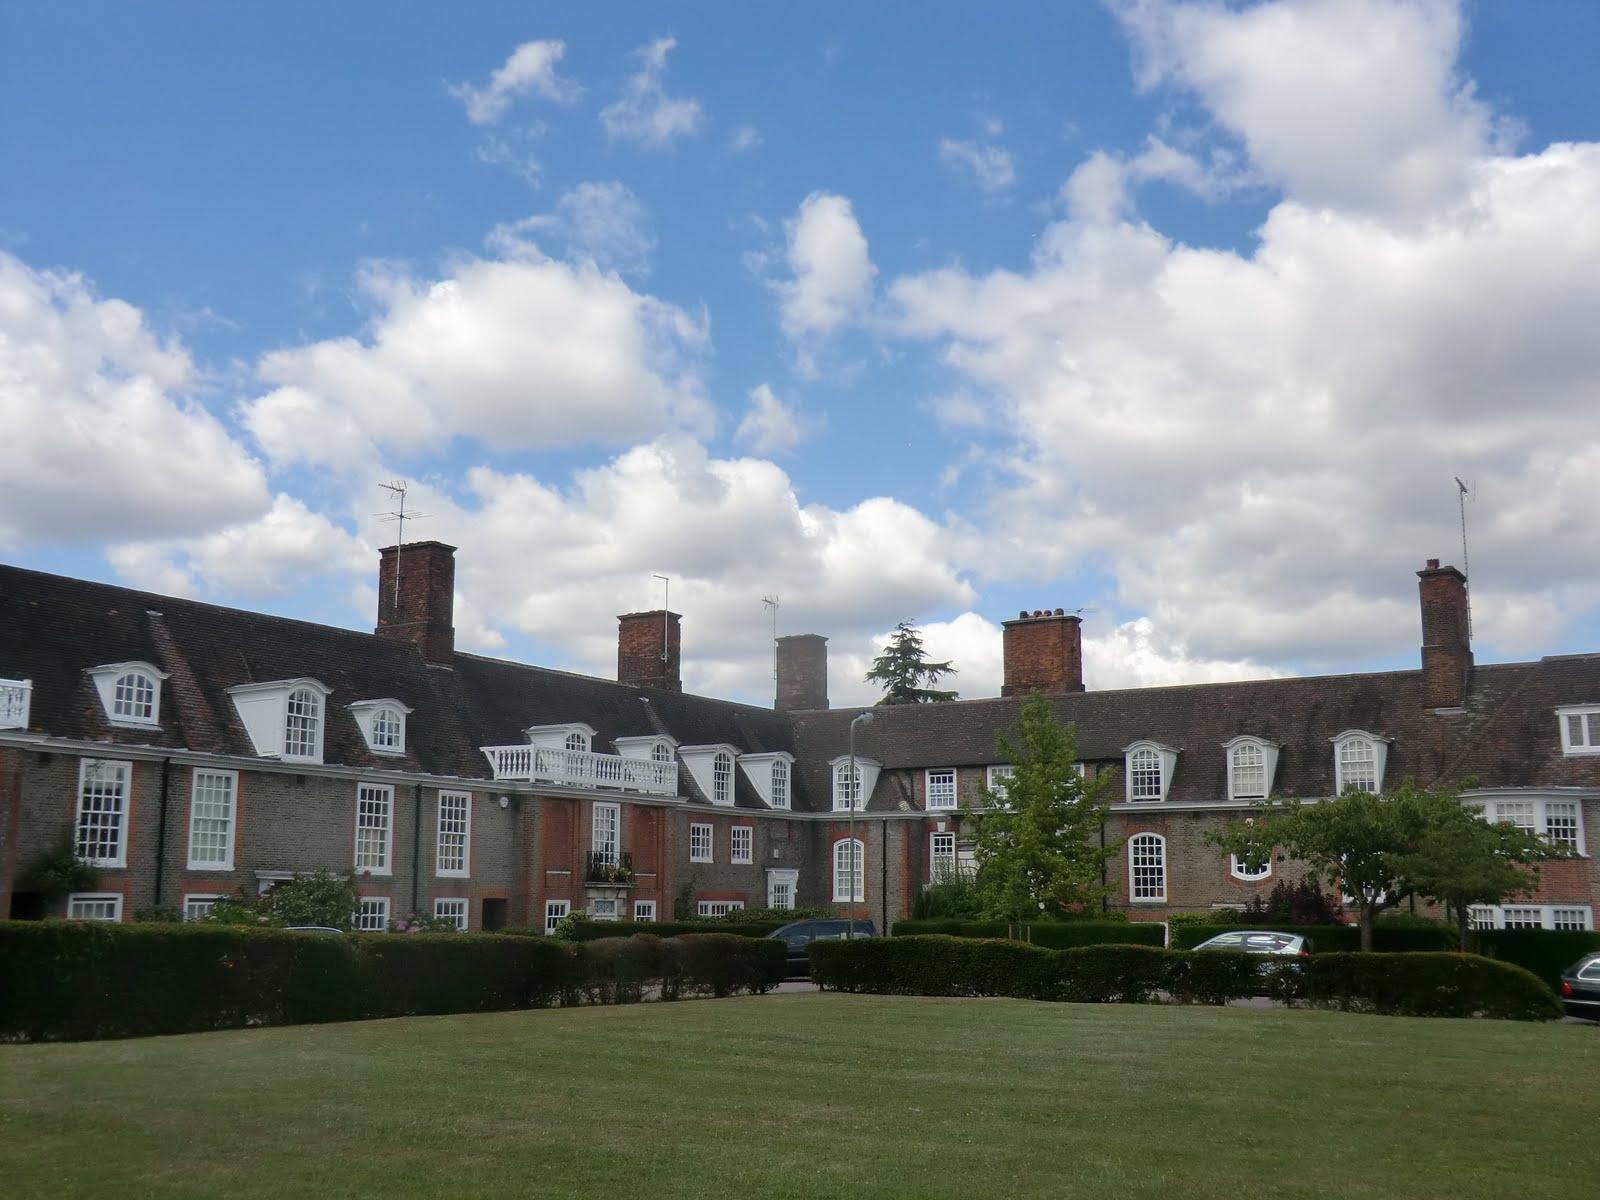 CIMG9234 North Square, Hampstead Garden Suburb